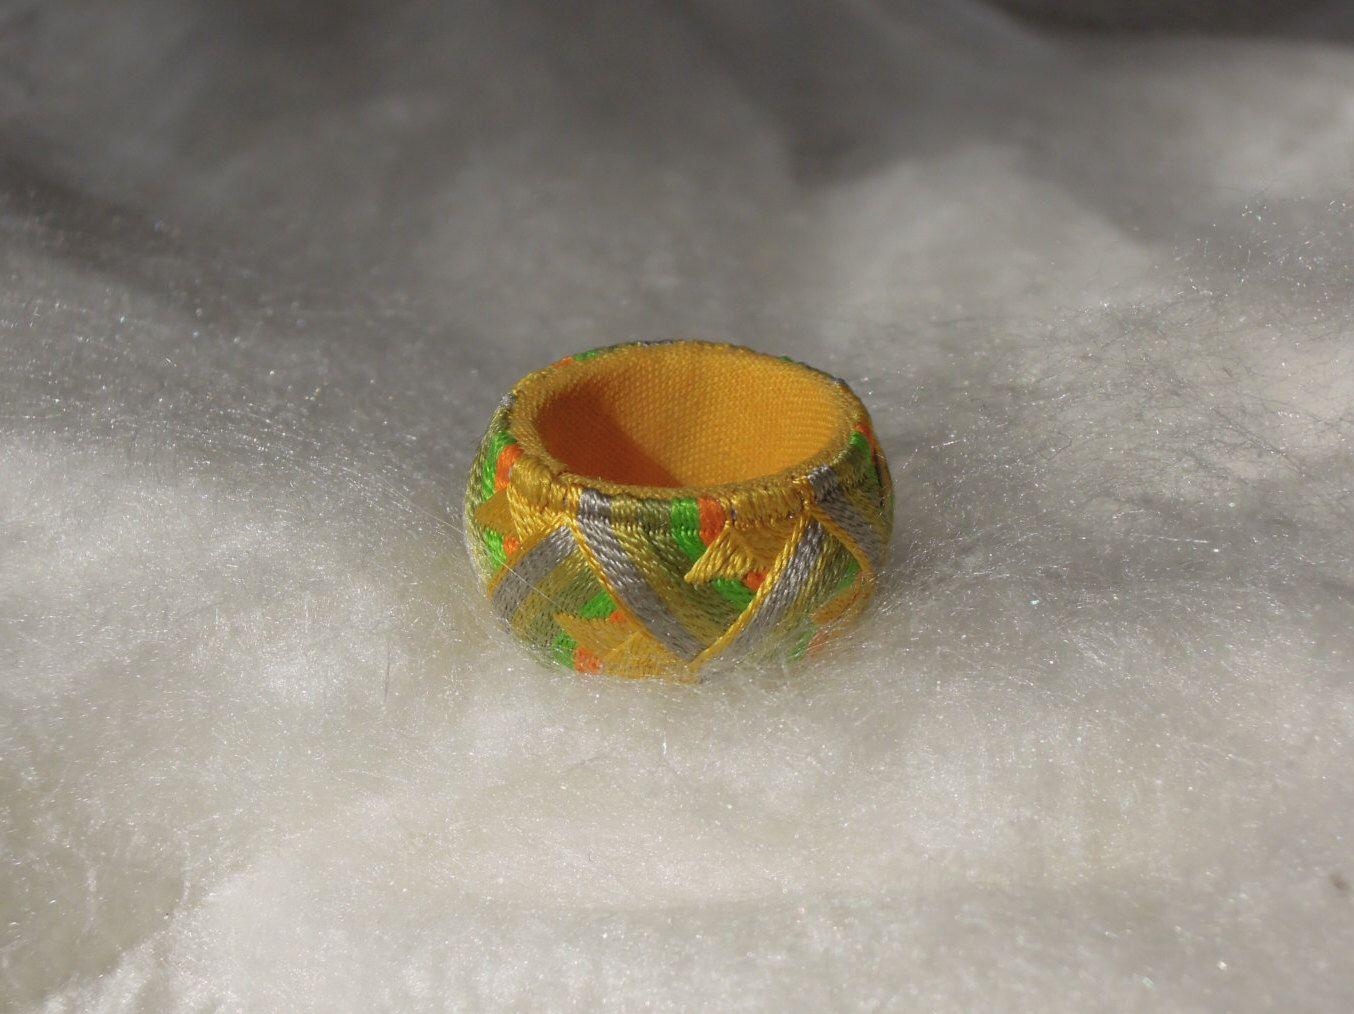 Yubinuki  指ぬき ゆびぬき - Bague en fil de soie - Hand made - Sorbet agrume - Dè à coudre traditionnel par YubinukiROYAL sur Etsy https://www.etsy.com/fr/listing/253253523/yubinuki-zhnukiyubinuki-bague-en-fil-de